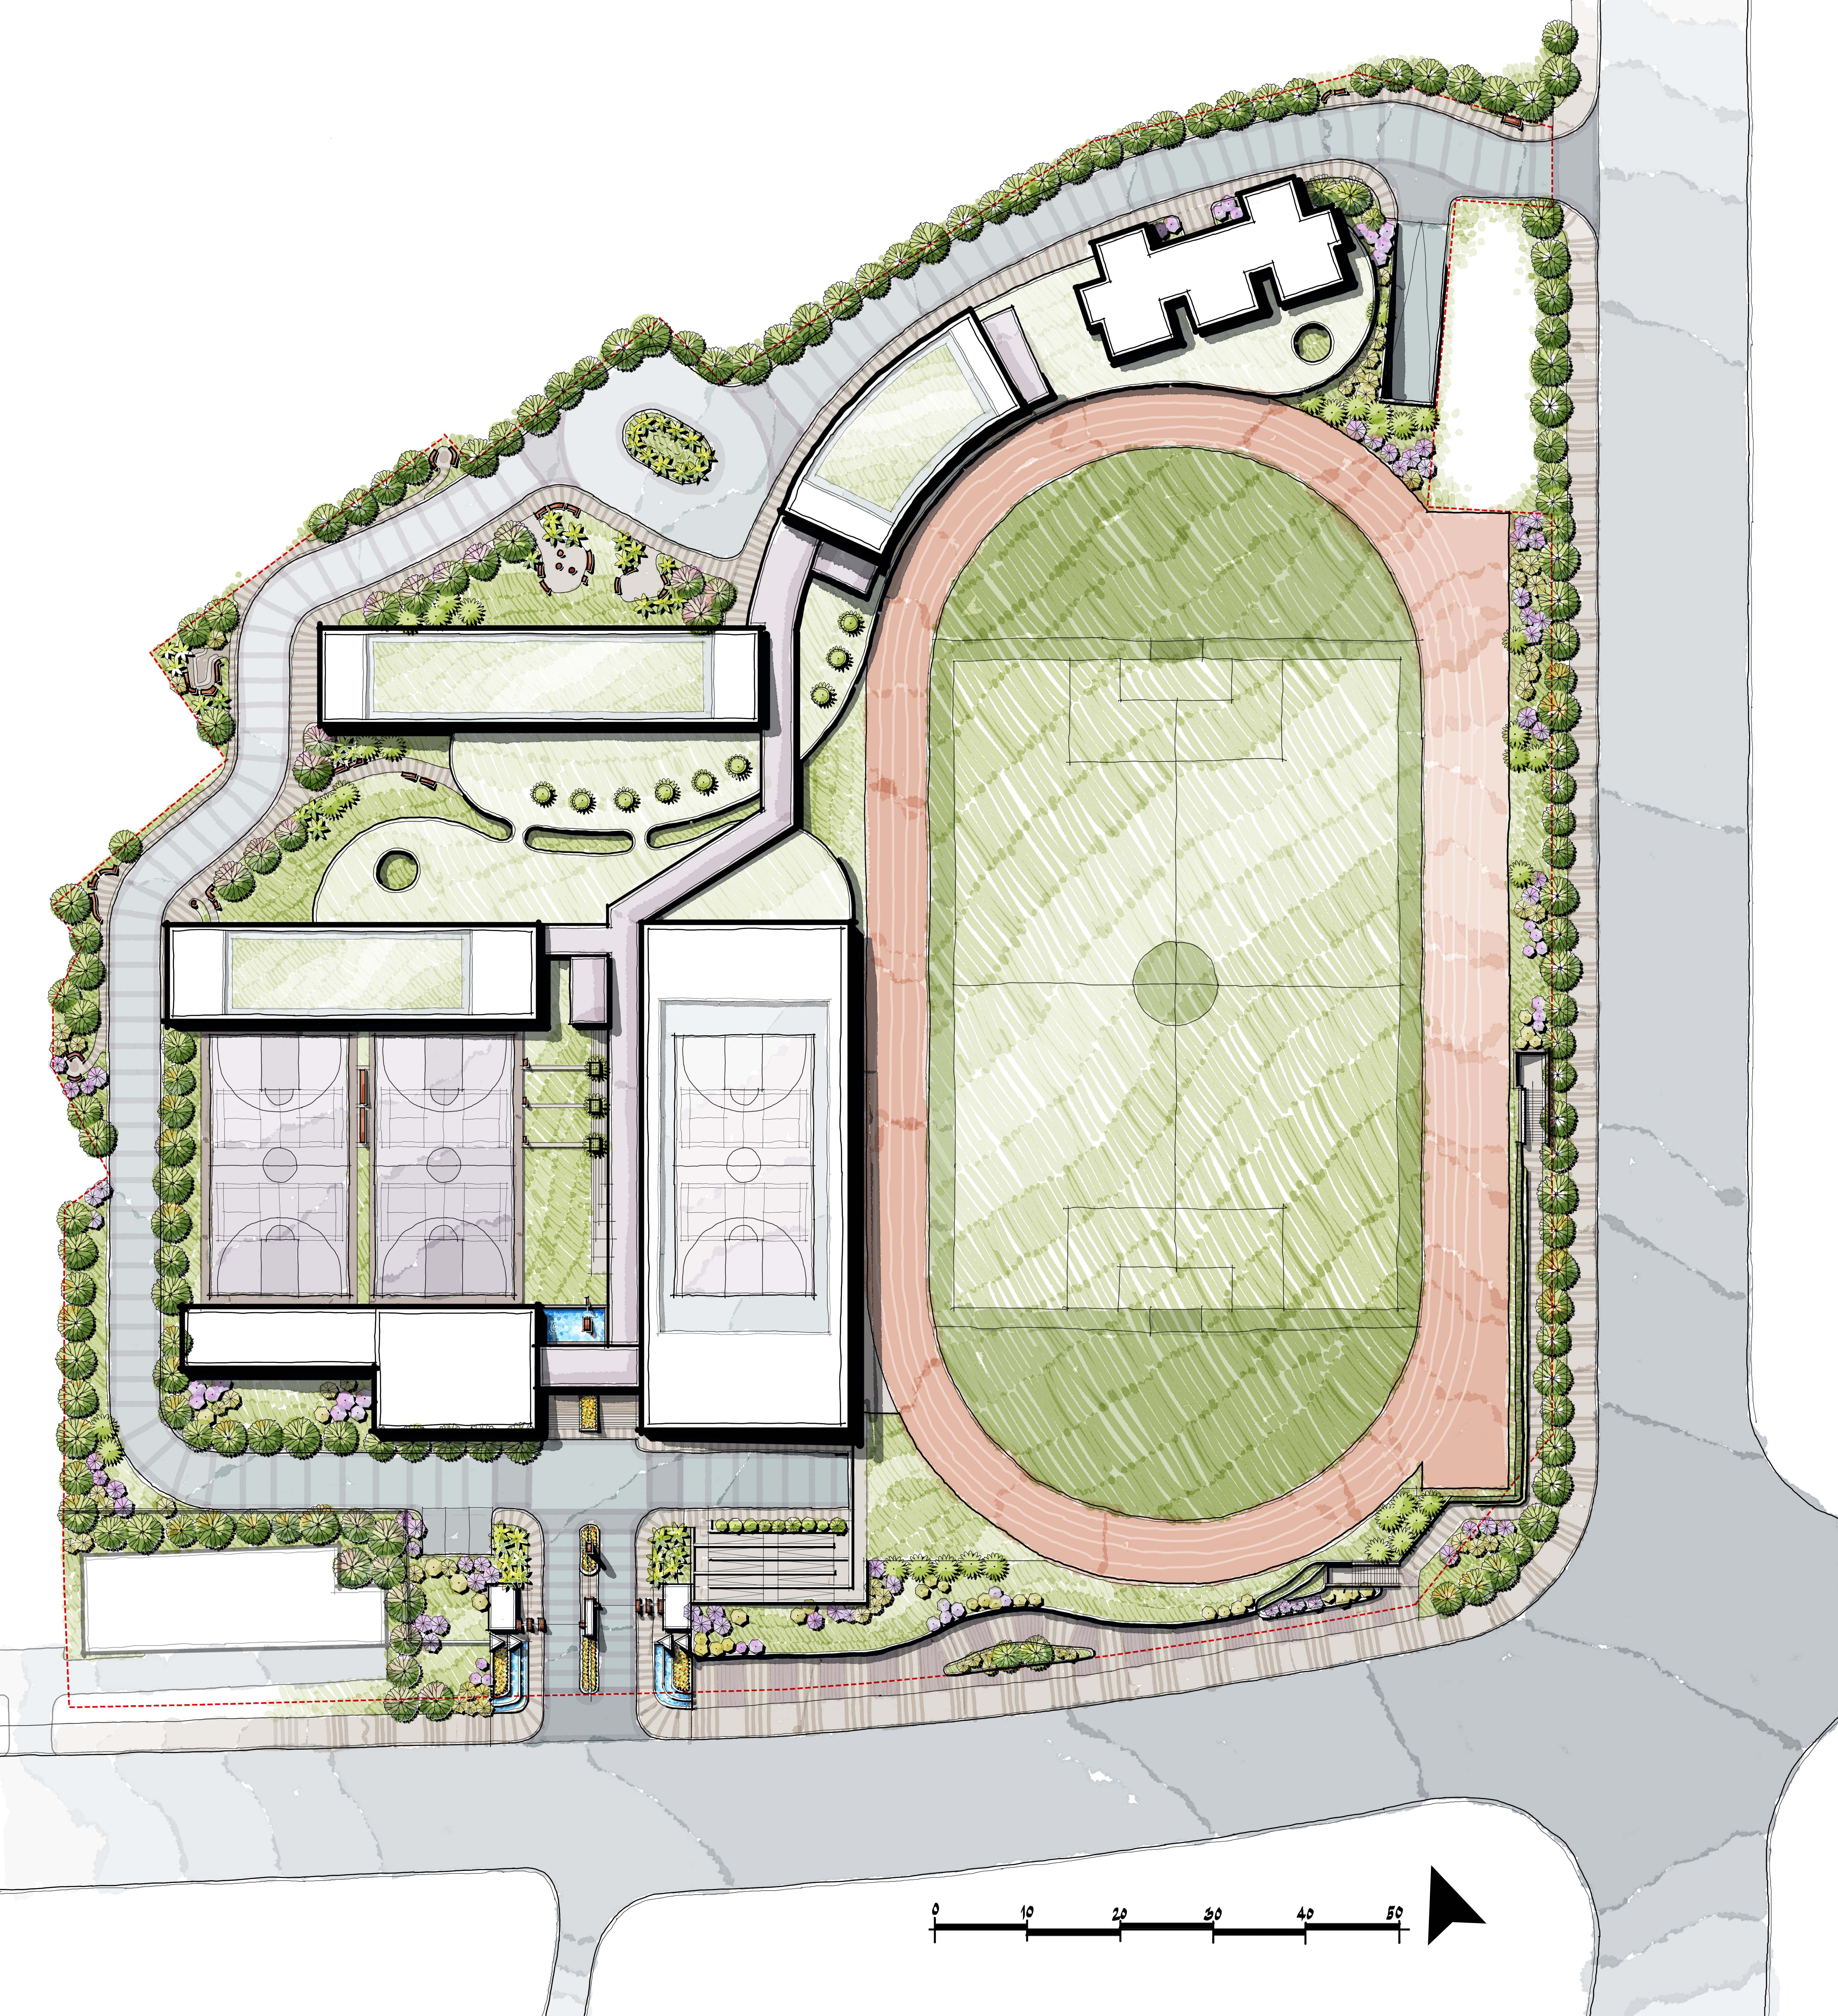 School Master Plan Landscape Design School Building Plans Master Plan Site Plan Design